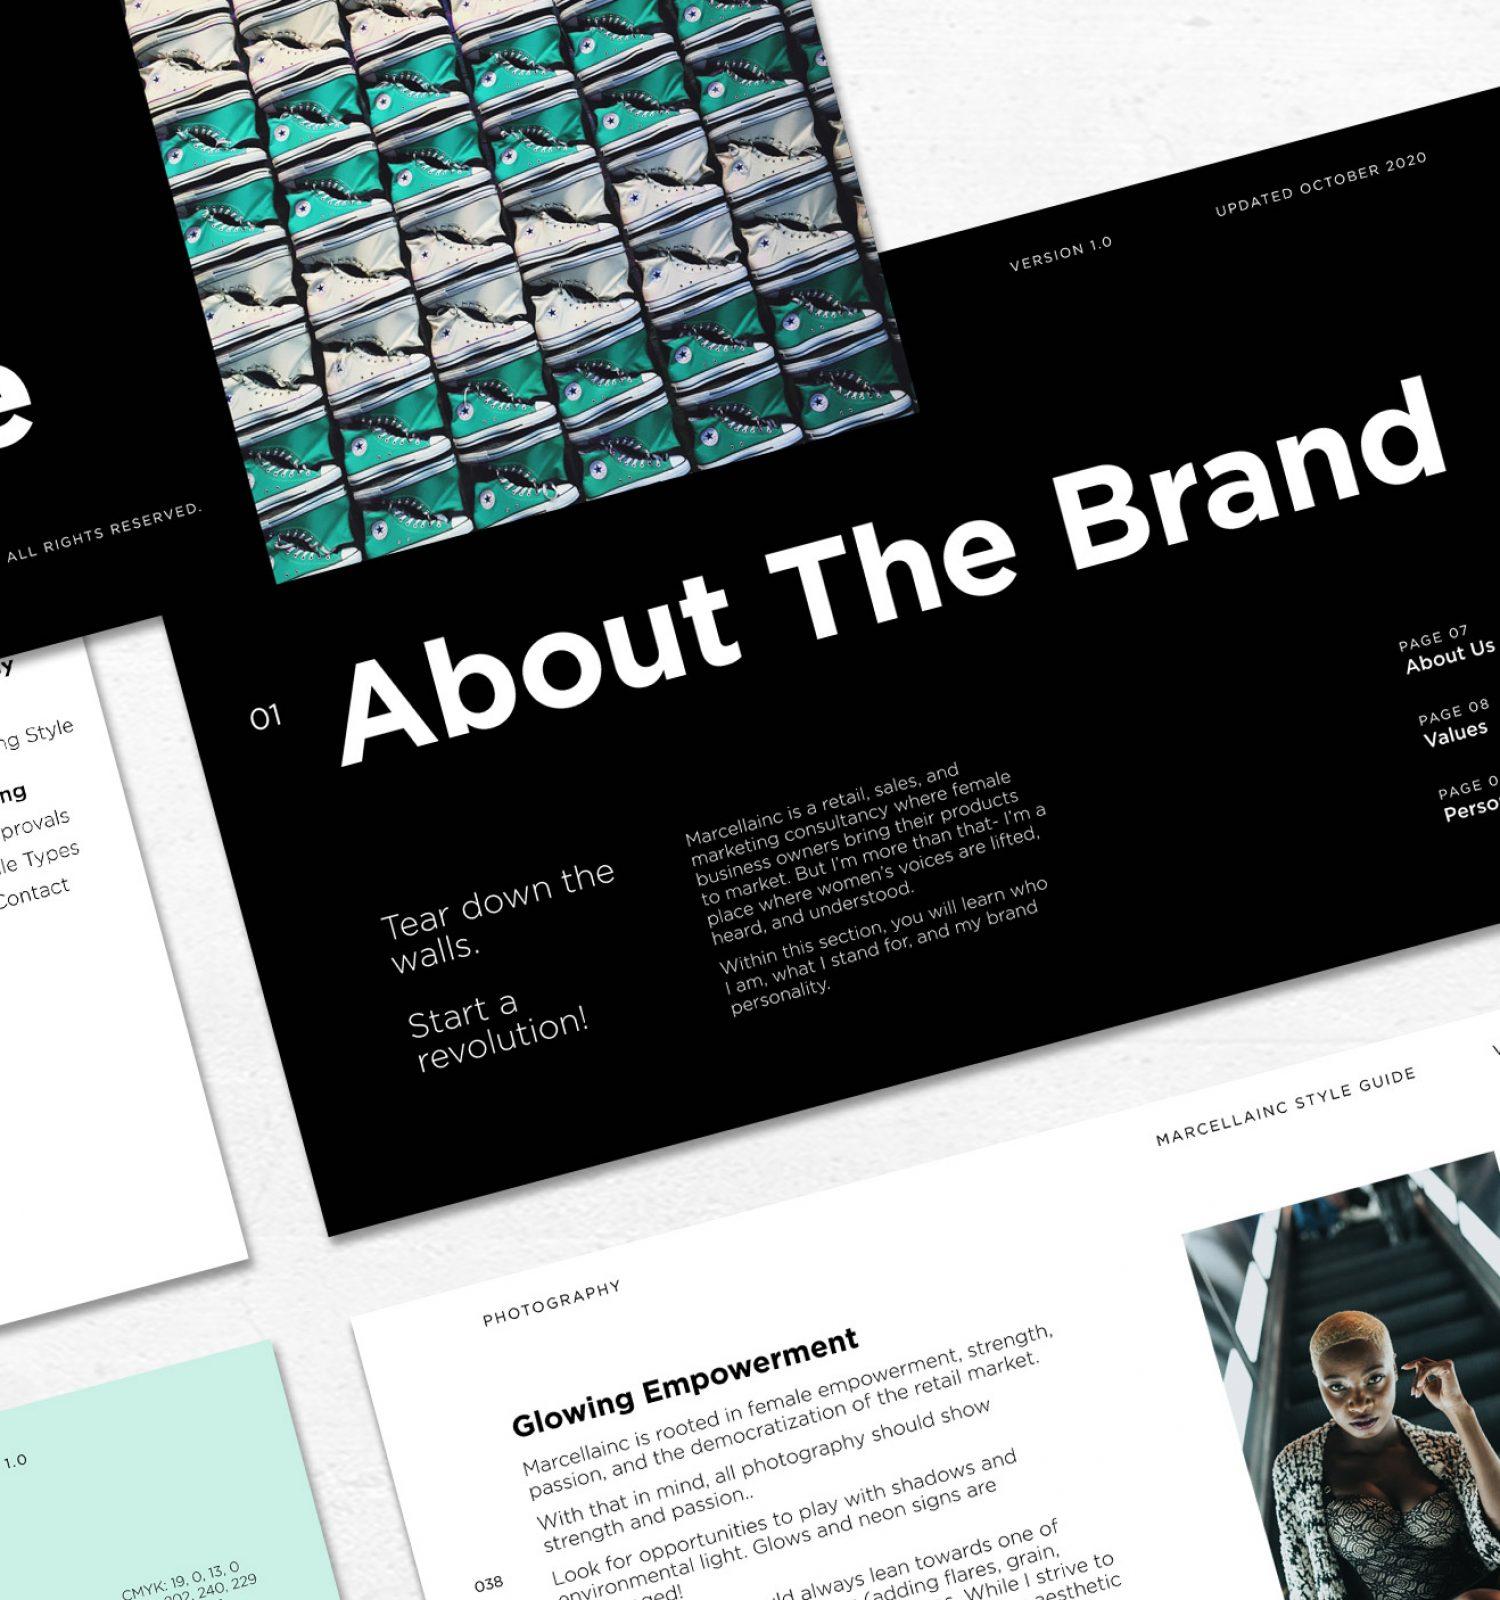 Marcella Inc Branding Style Guide